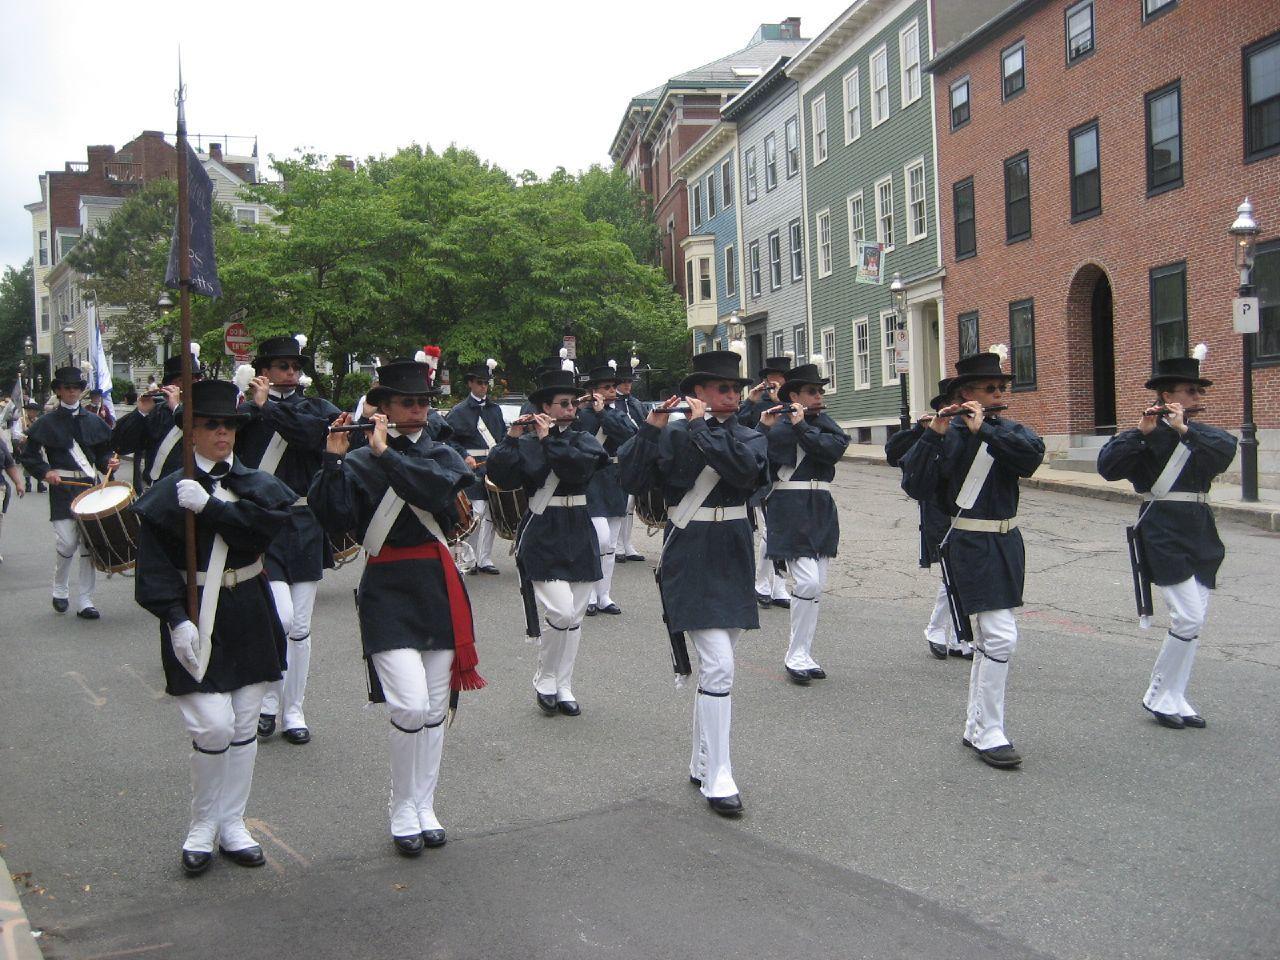 Bunker Hill Day Celebrations